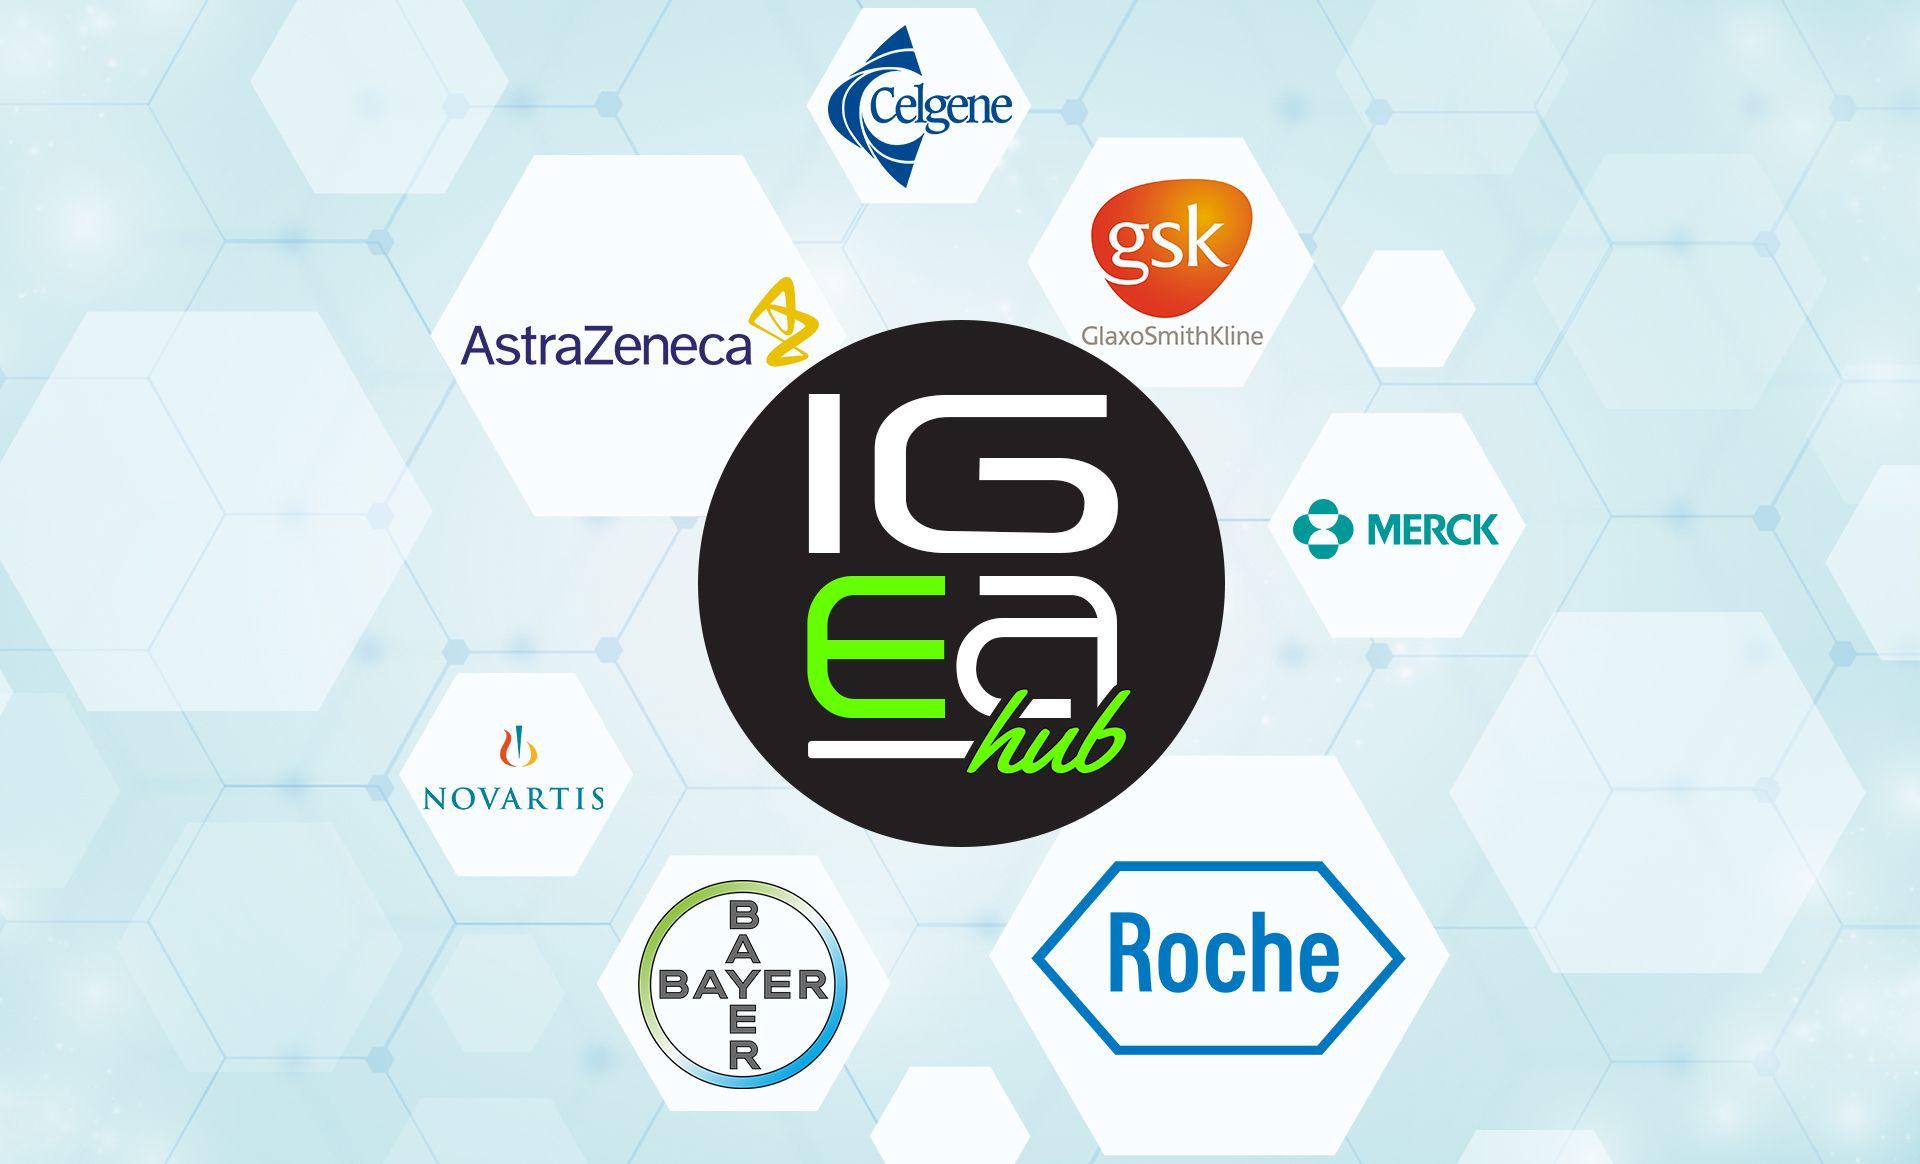 IgeaHub News Roche, Merck, Pharma